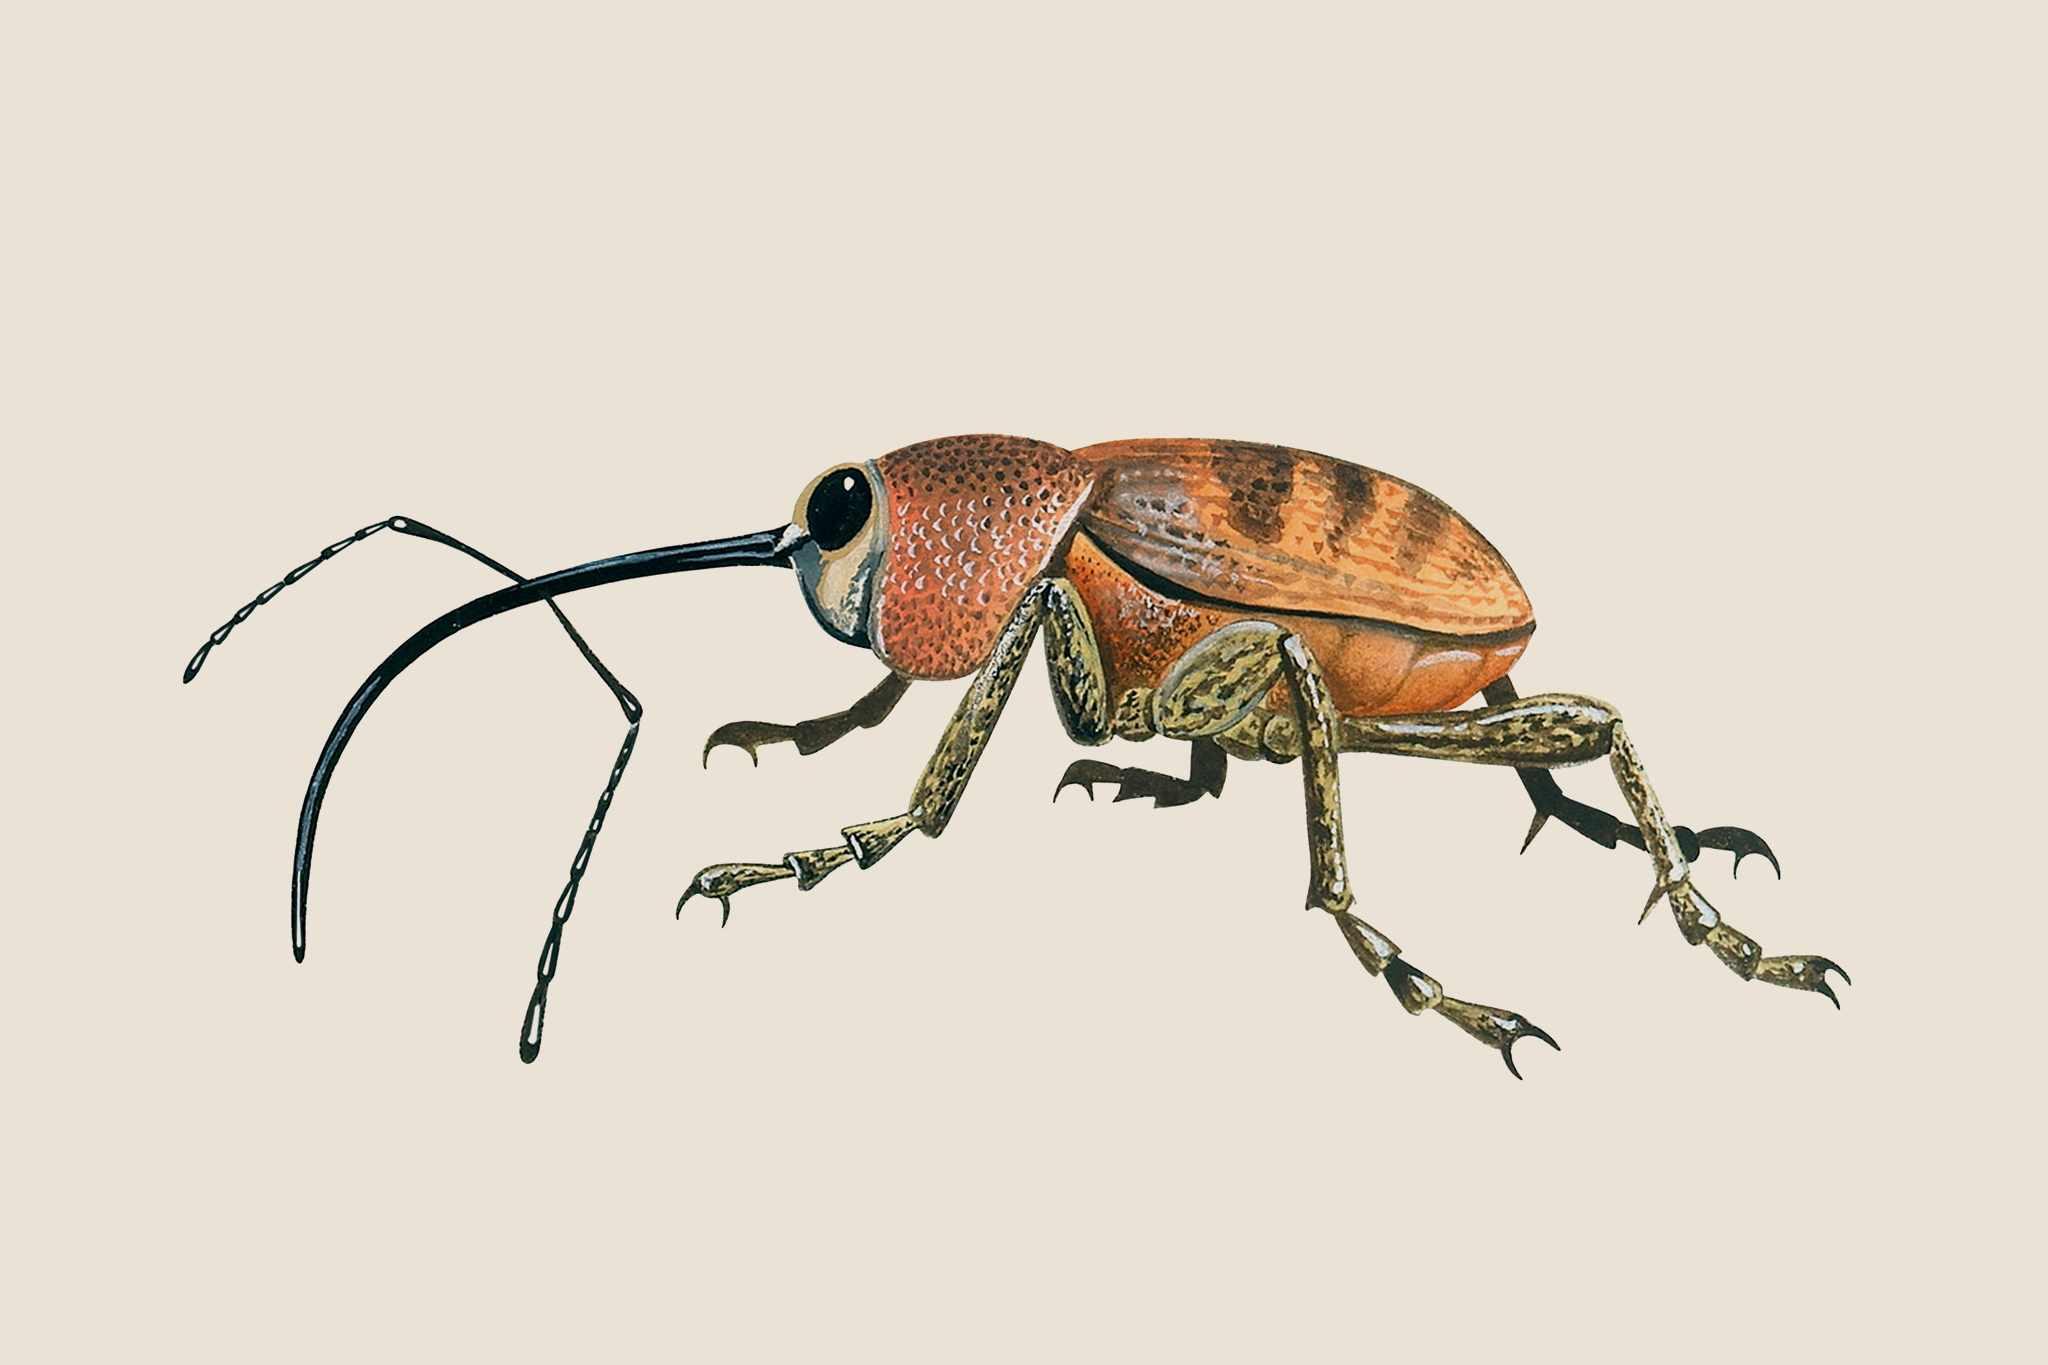 Garden wildlife identifier: weevils and flower beetles